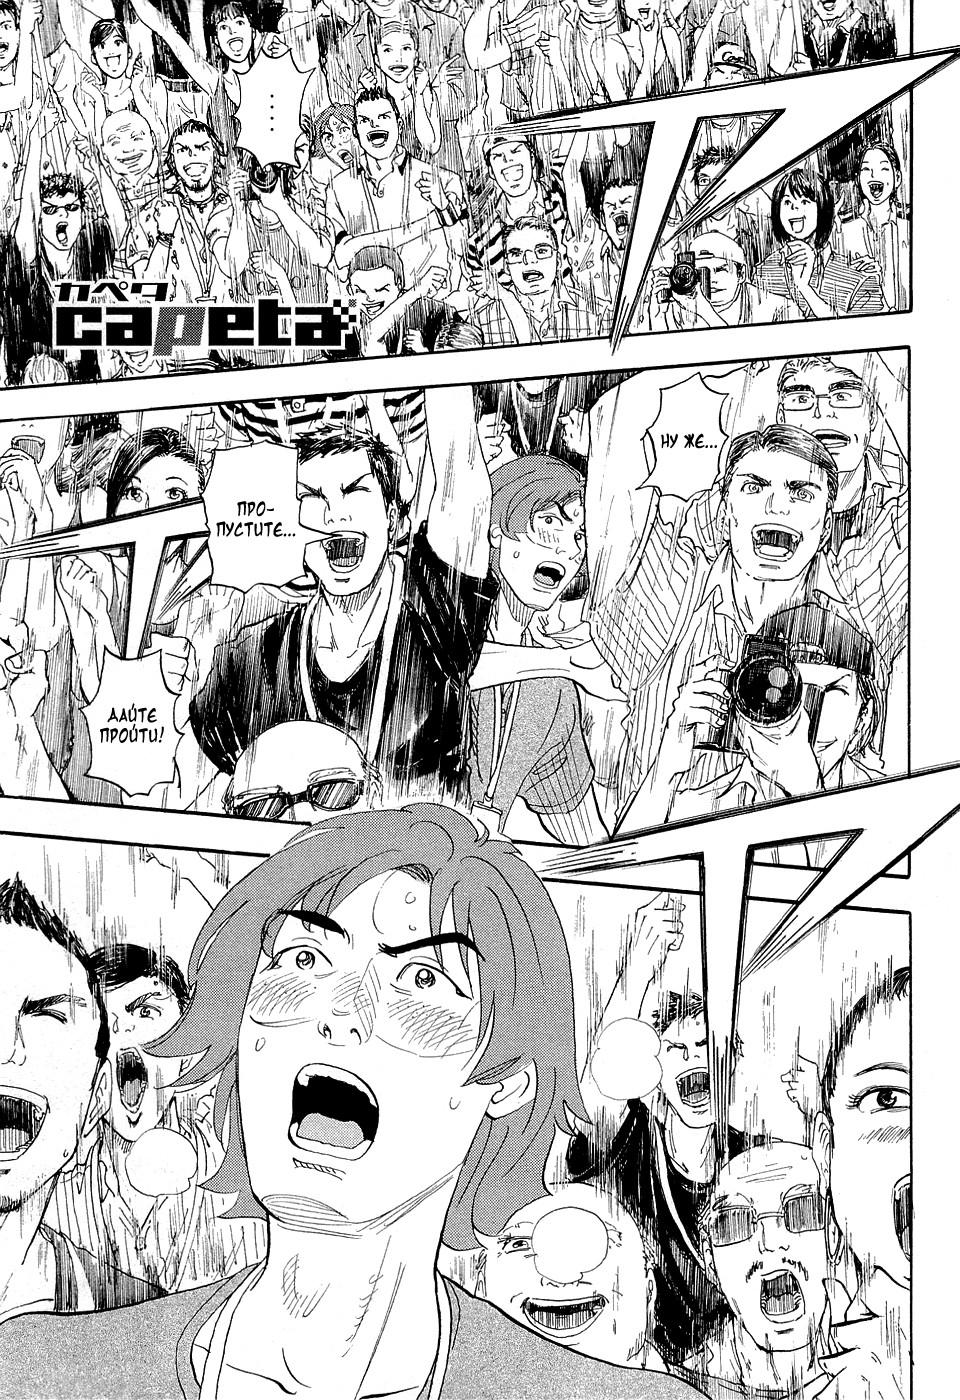 https://r1.ninemanga.com/comics/pic2/47/22127/301322/1462295666272.jpg Page 1